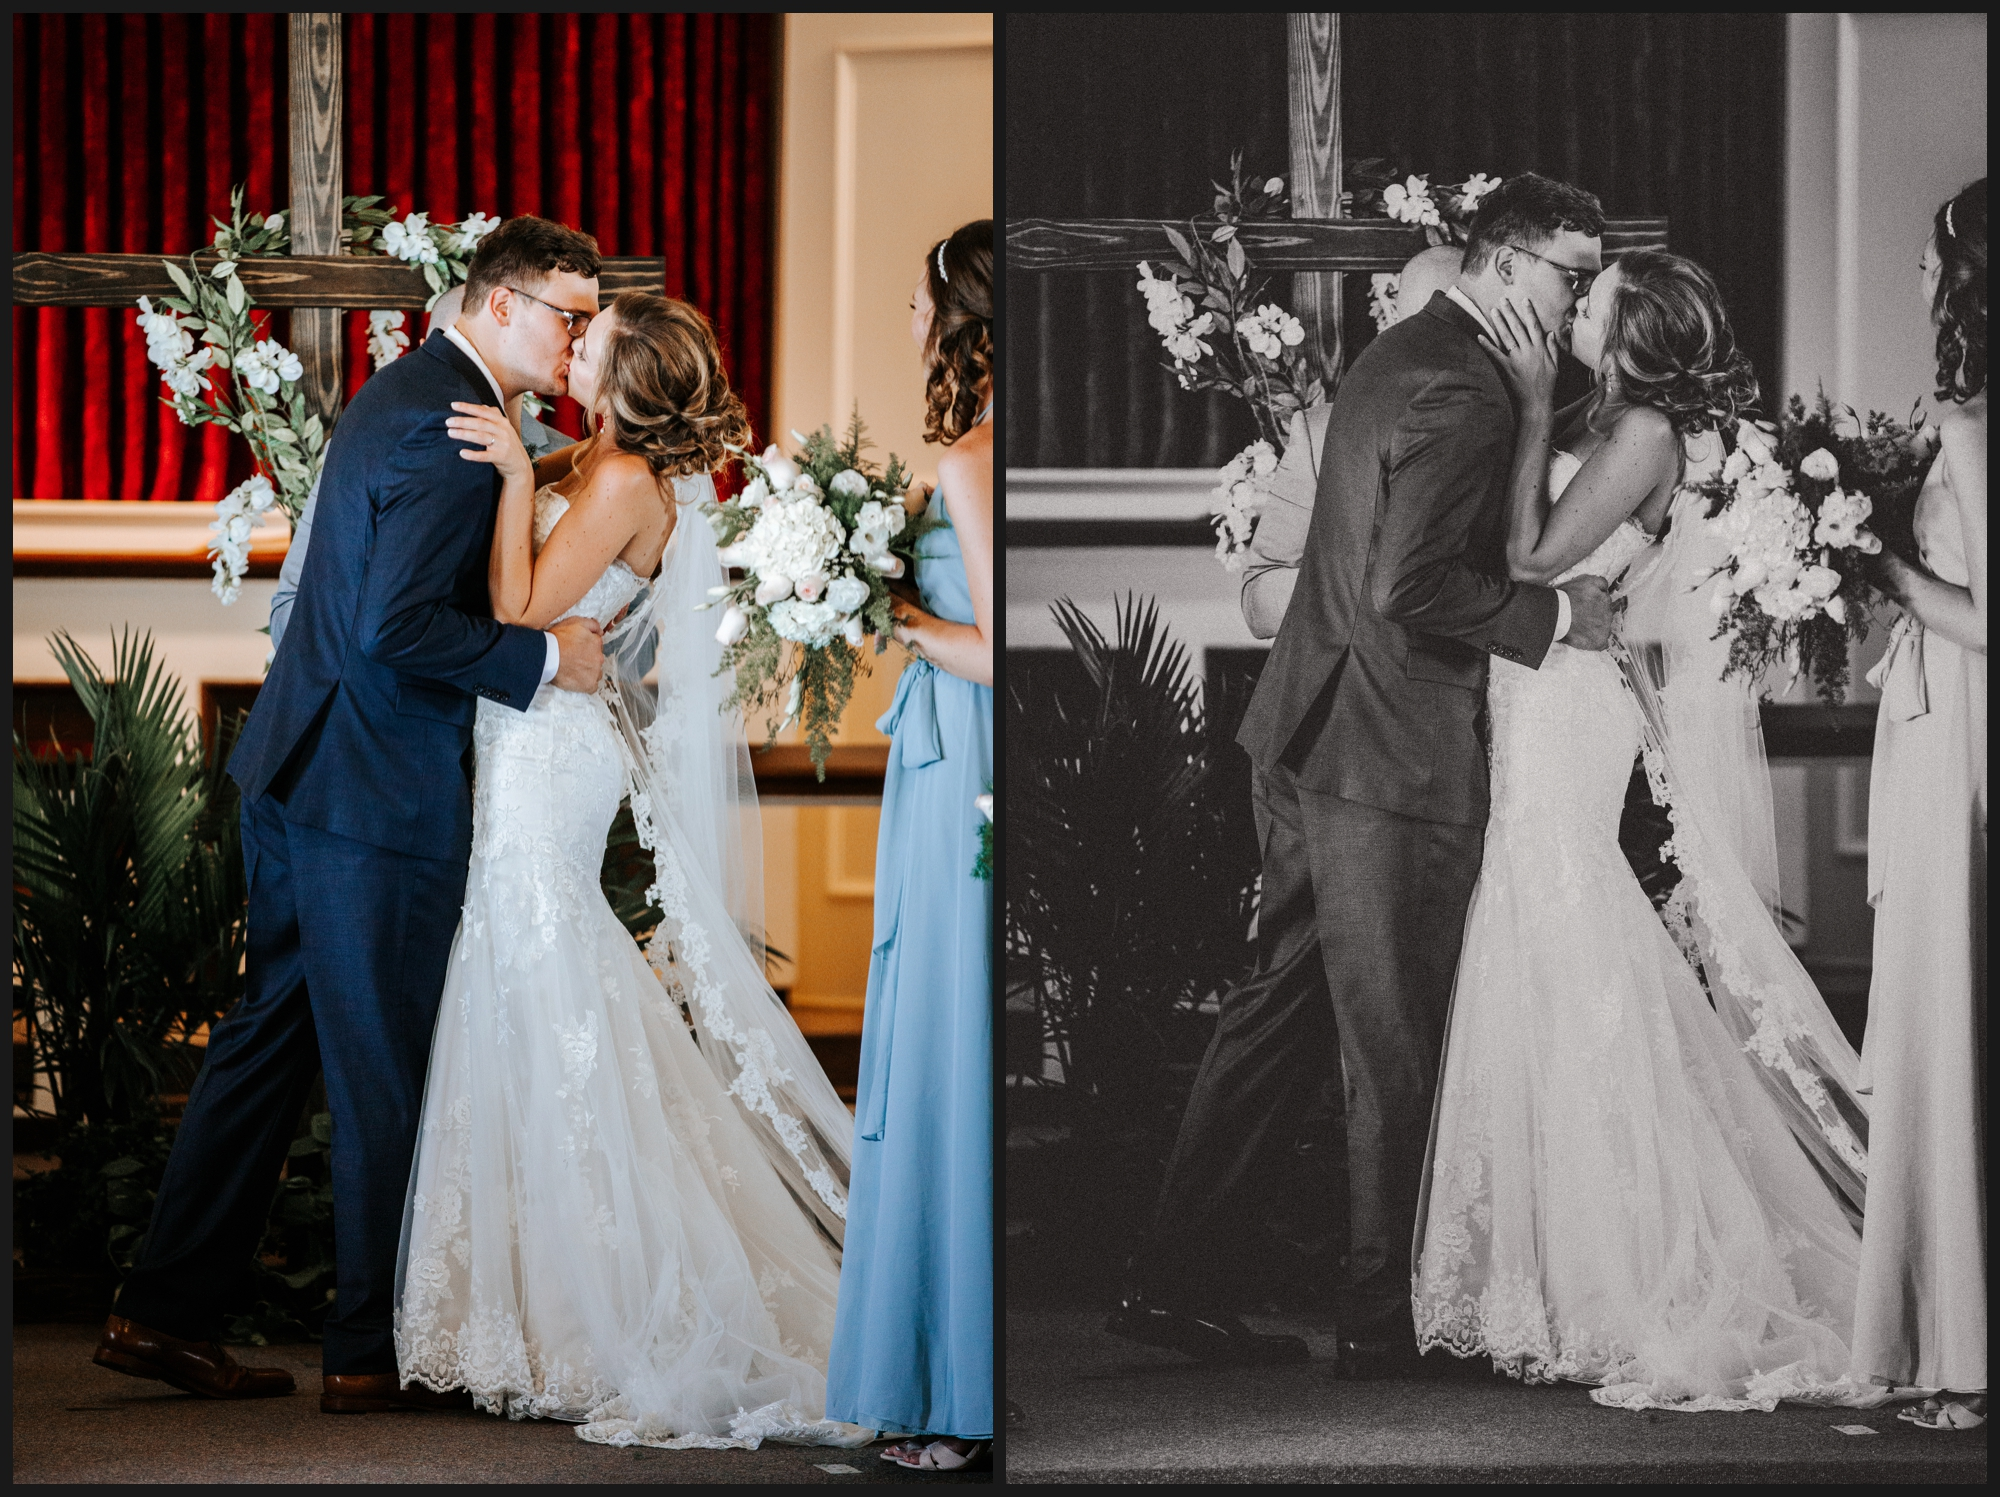 Orlando-Wedding-Photographer-destination-wedding-photographer-florida-wedding-photographer-bohemian-wedding-photographer_0018.jpg